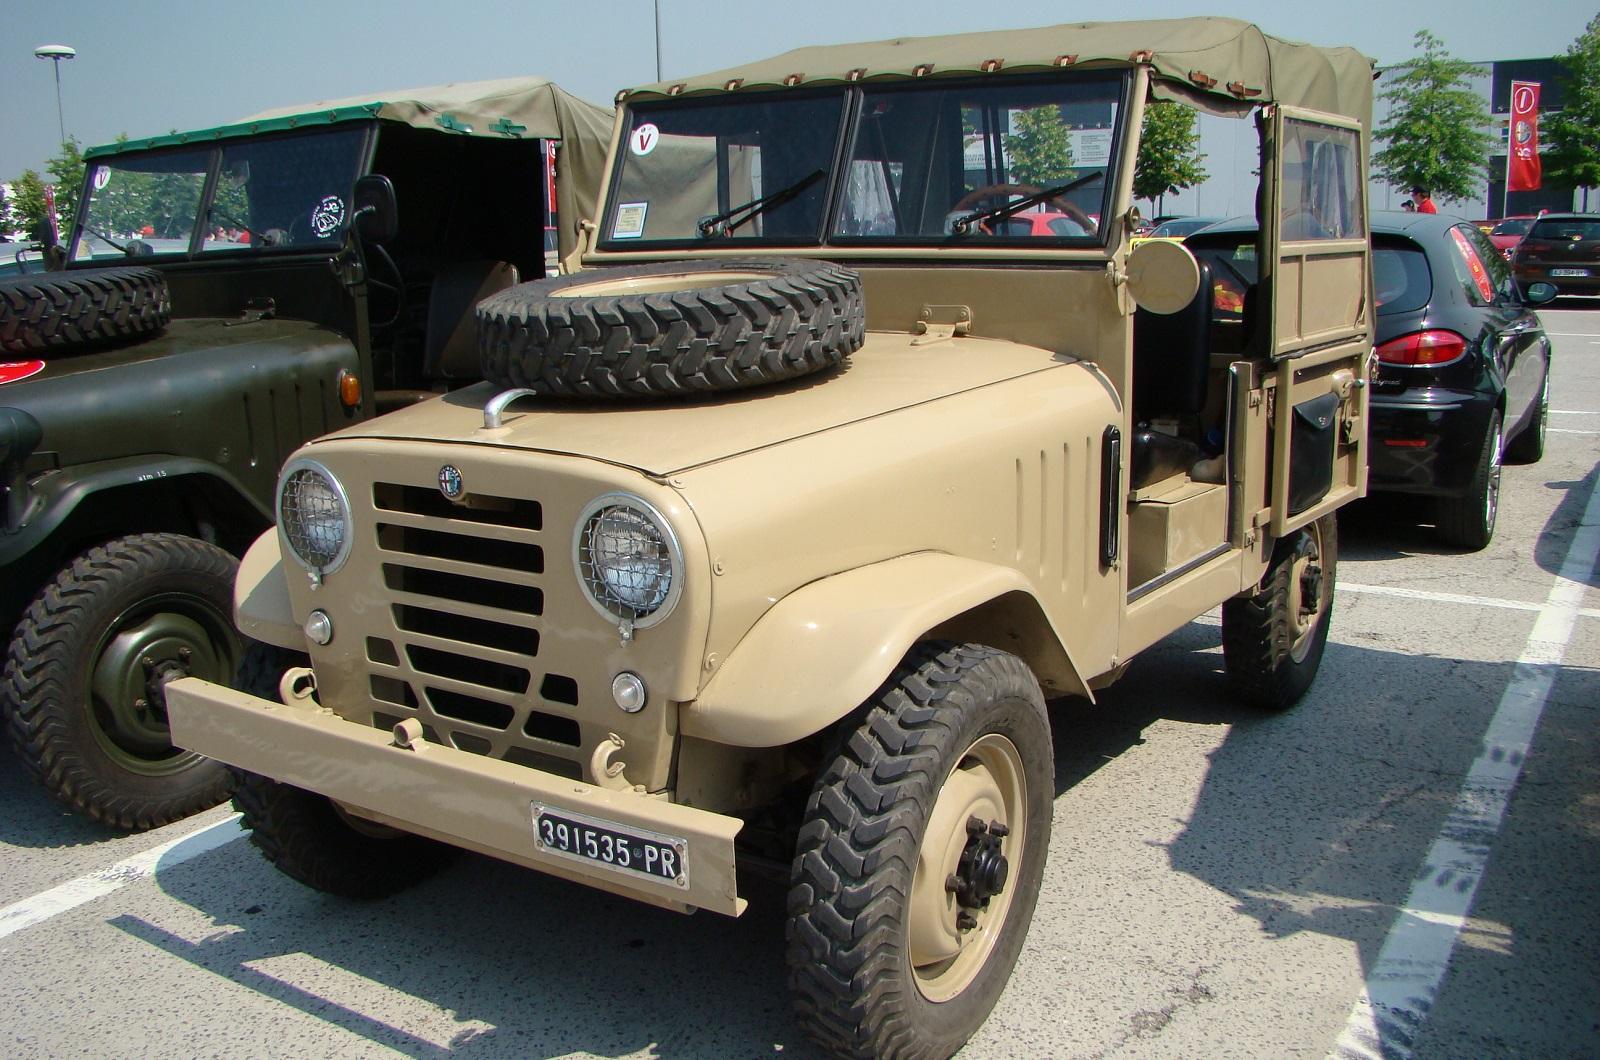 Long-forgotten vehicle